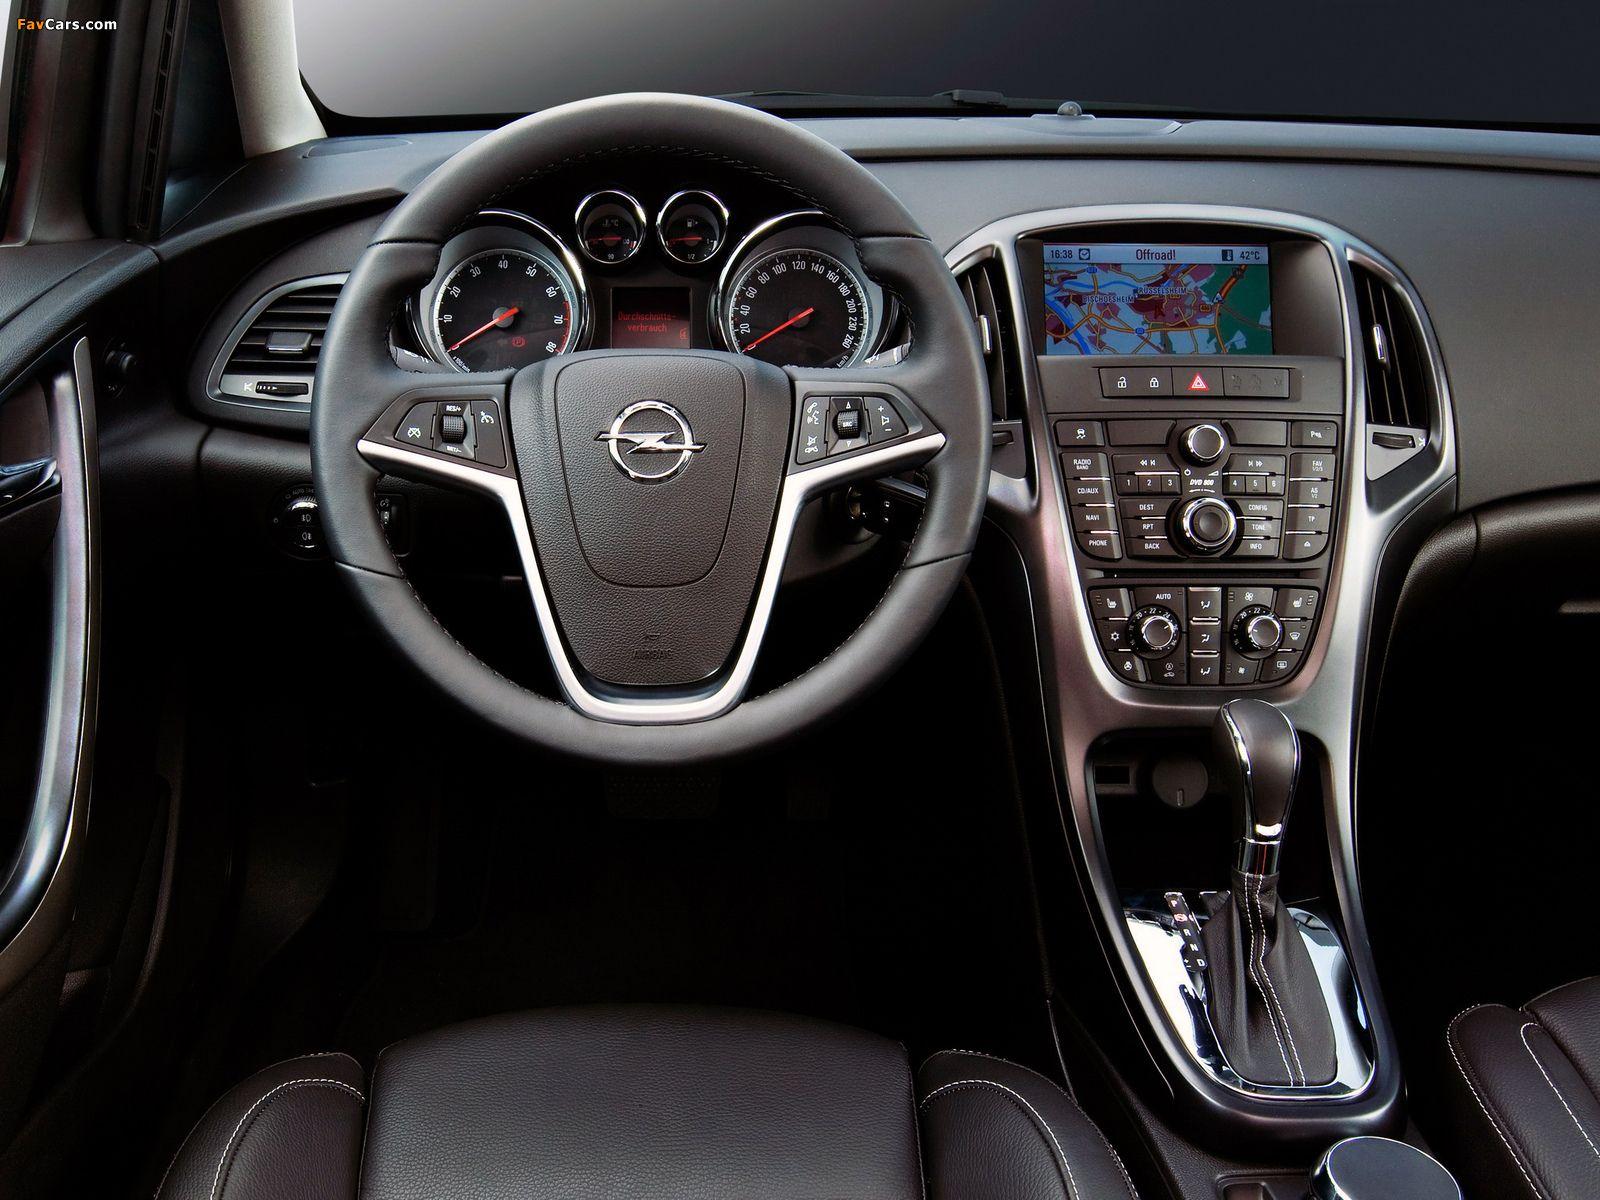 Opel Astra Sedan J 2012 Opel Facelift Turbo Intercooler